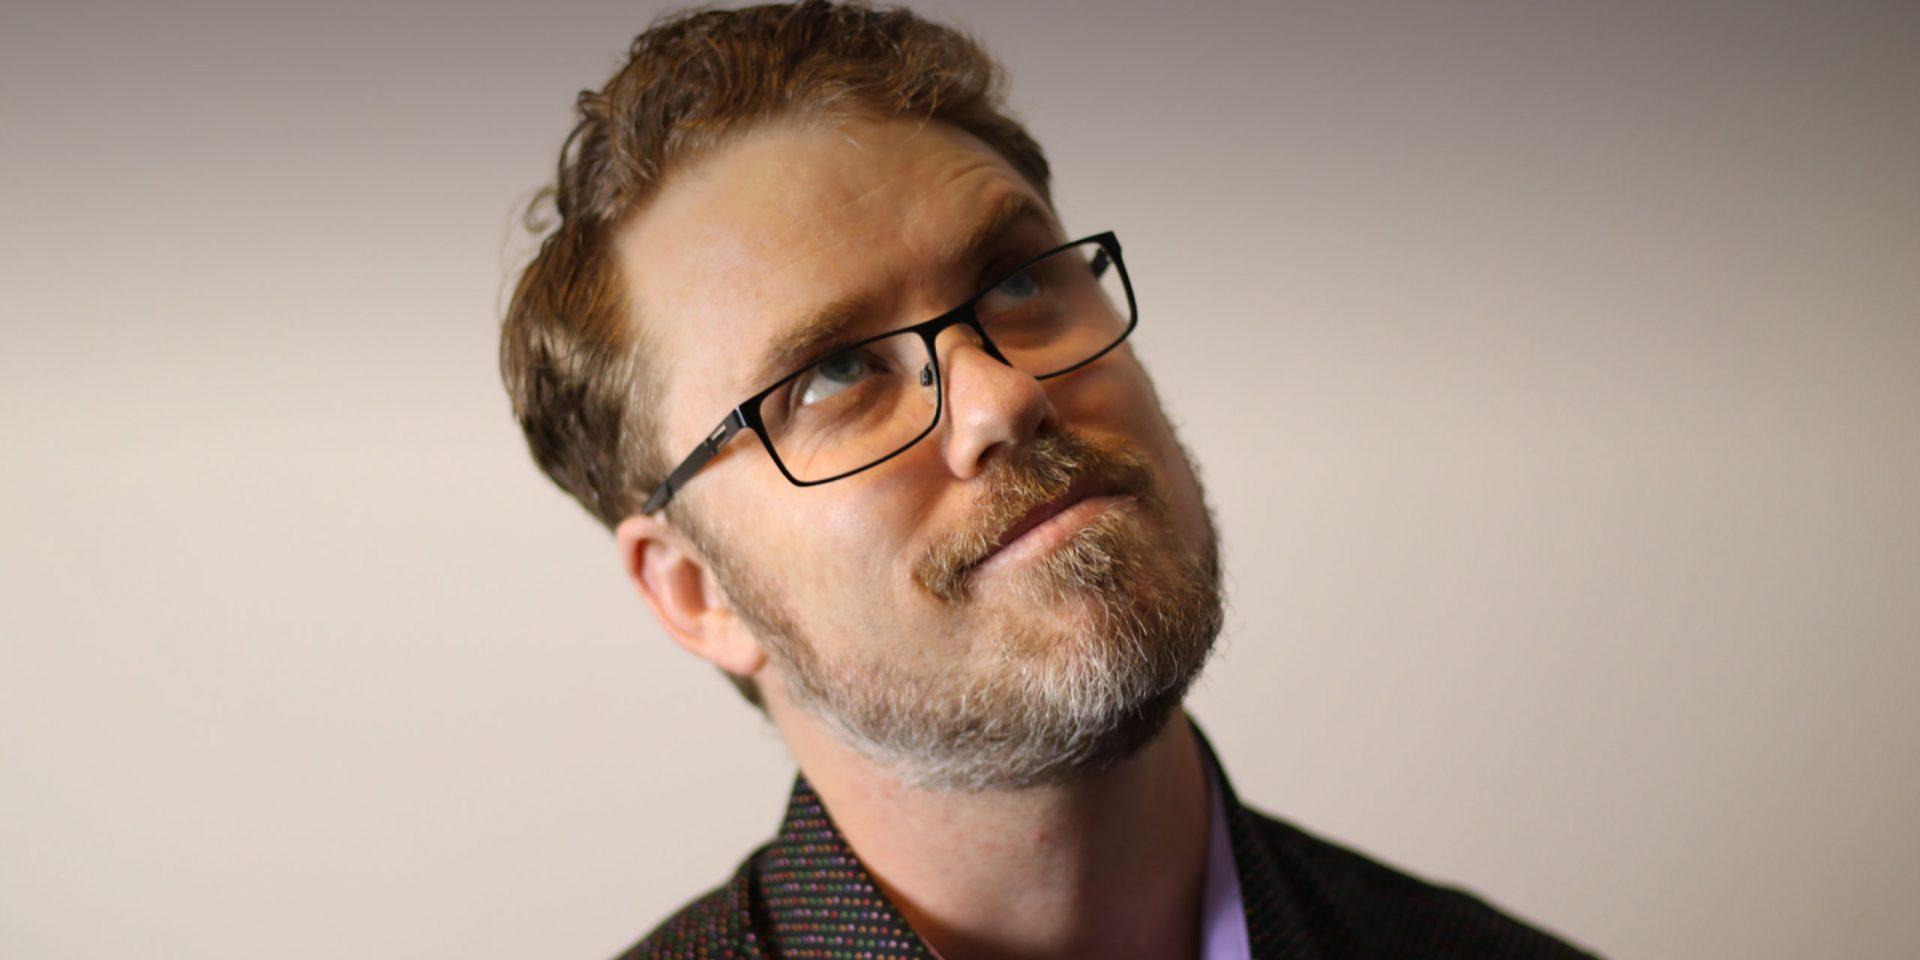 About Tim Van martin the Holistic full-stack unicorn designer